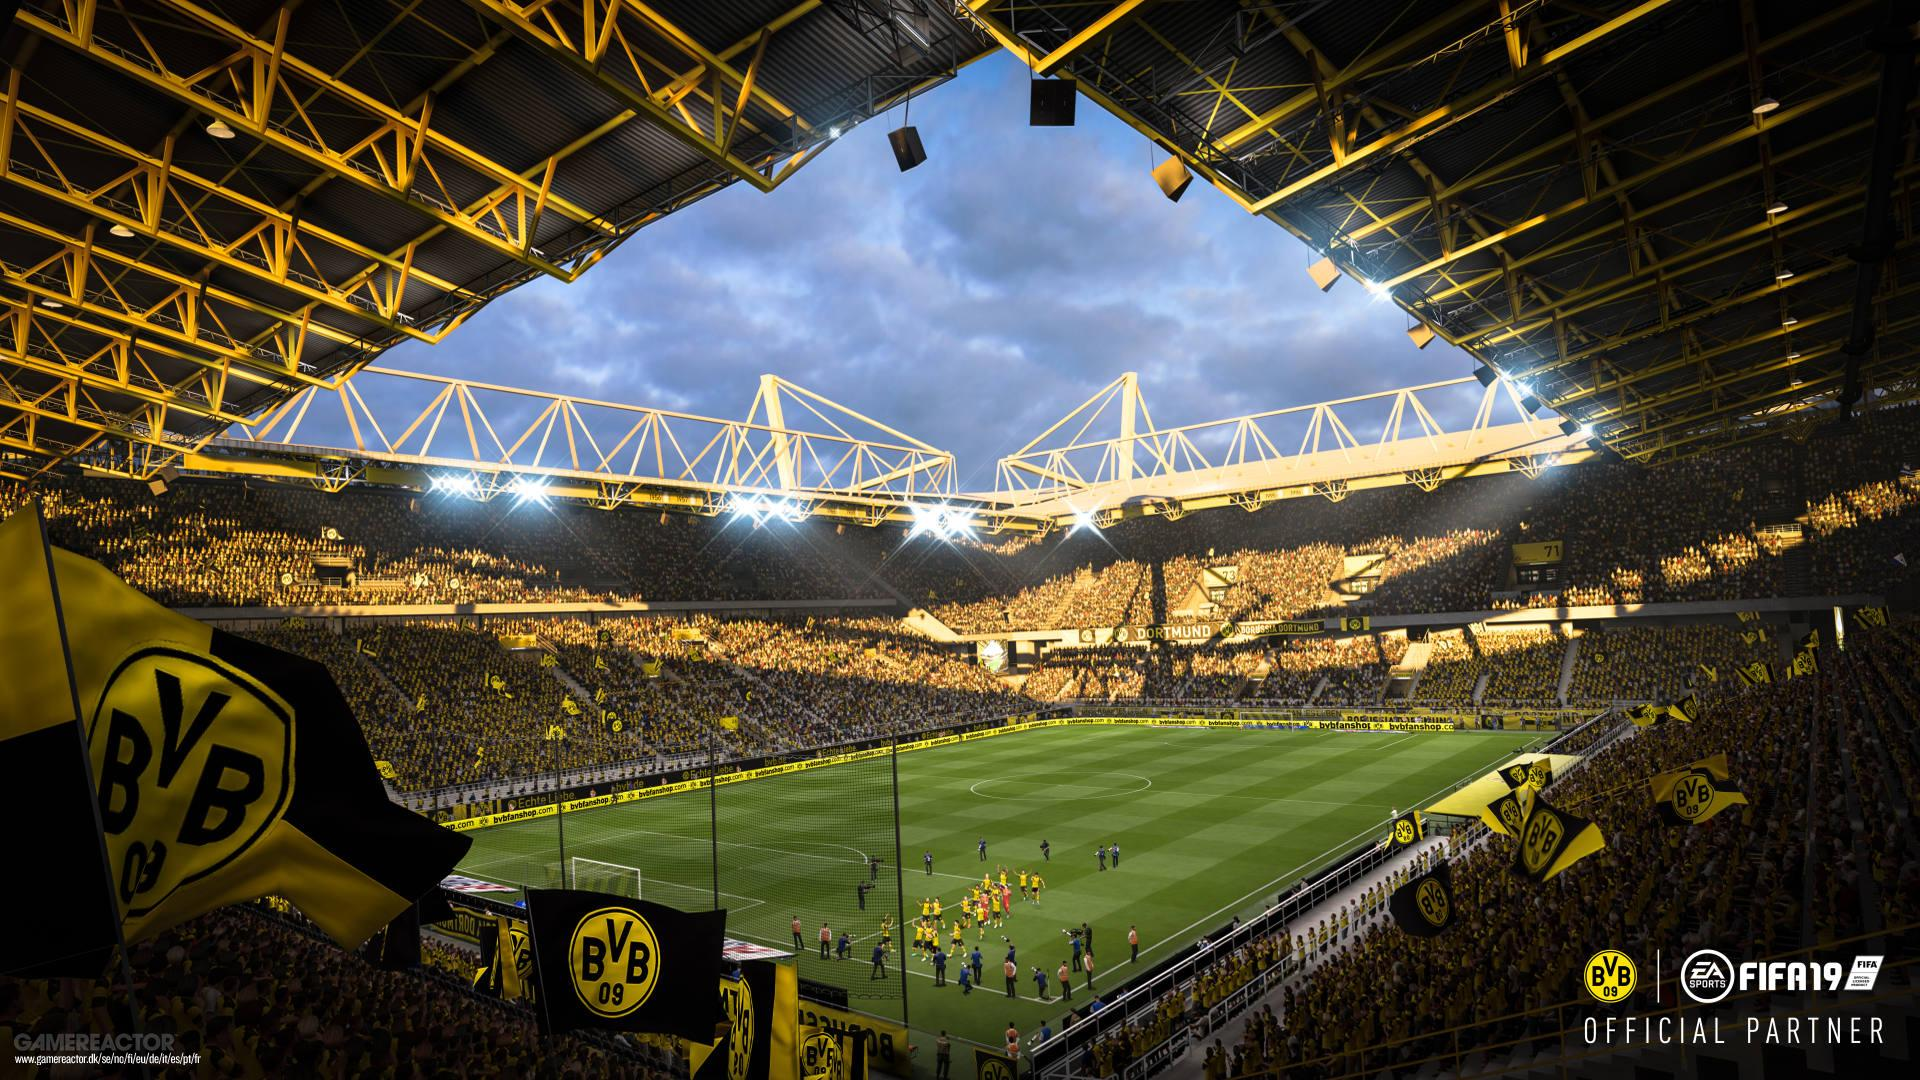 Borussia Dortmund Partners Up With Fifa 19